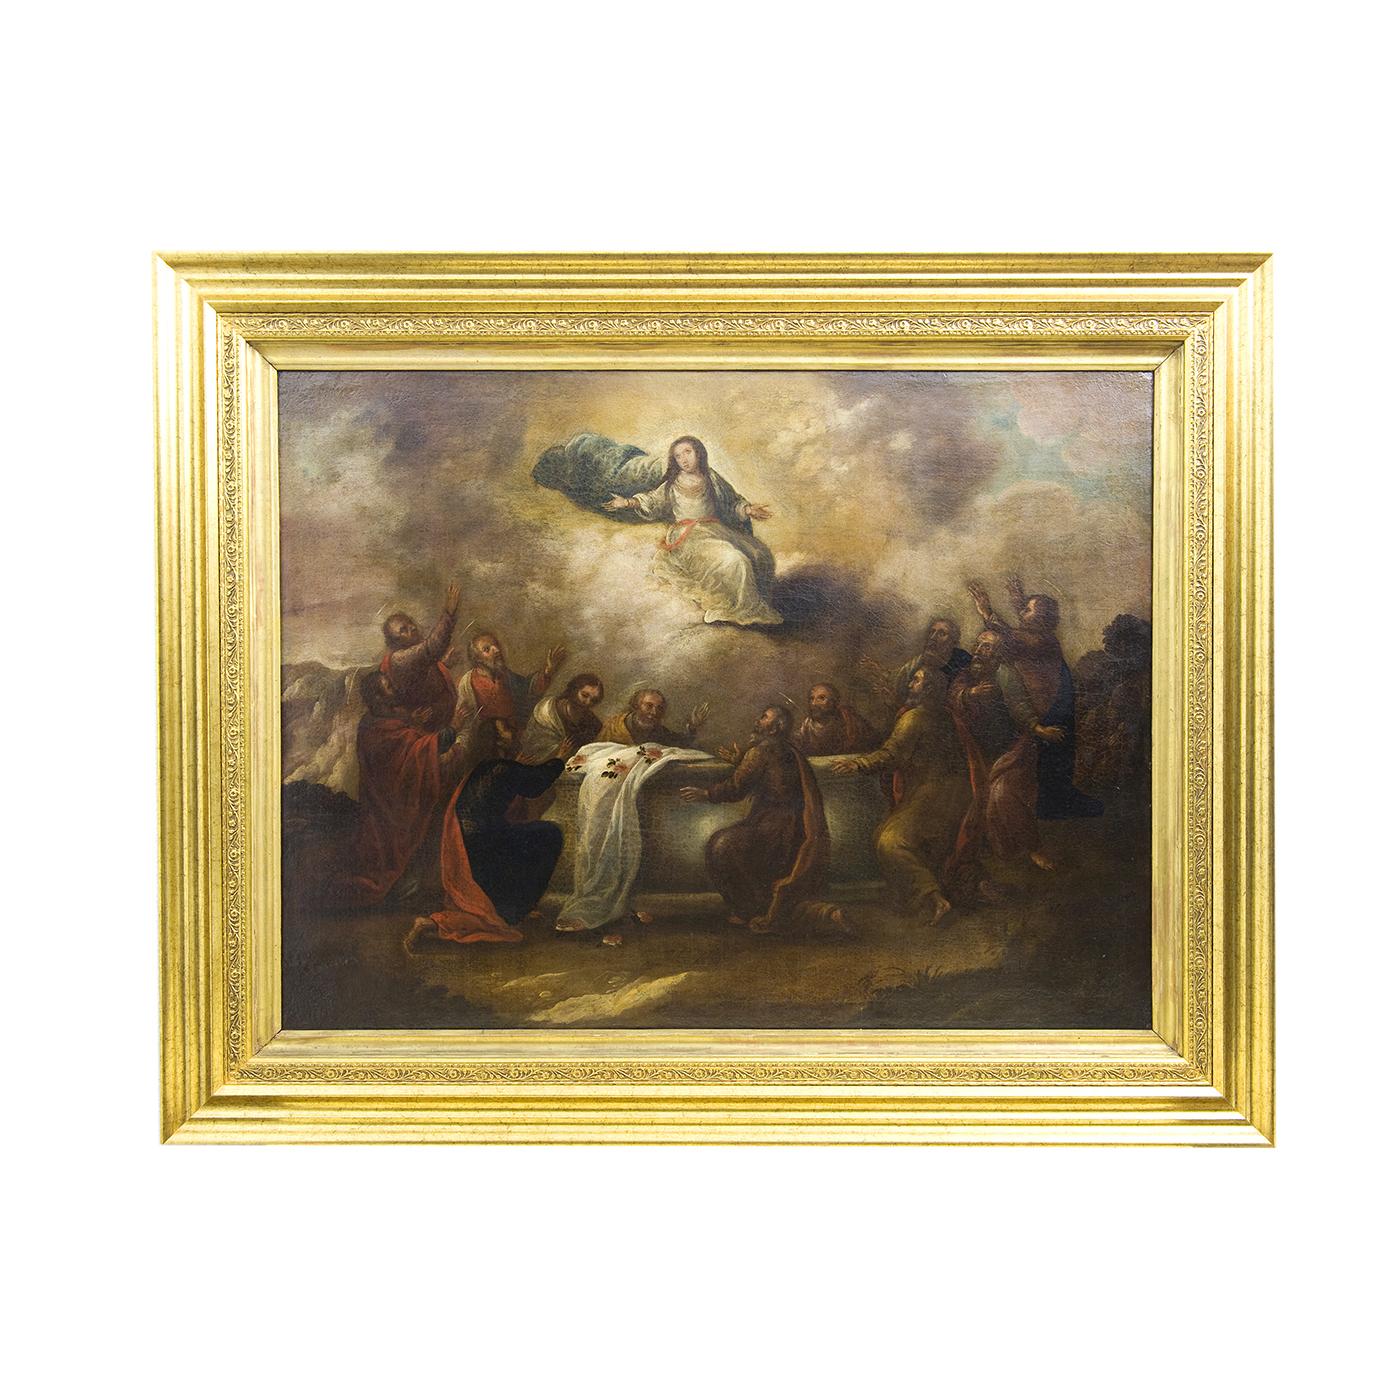 ESCUELA ESPAÑOLA Siglo XVII. Óleo sobre lienzo